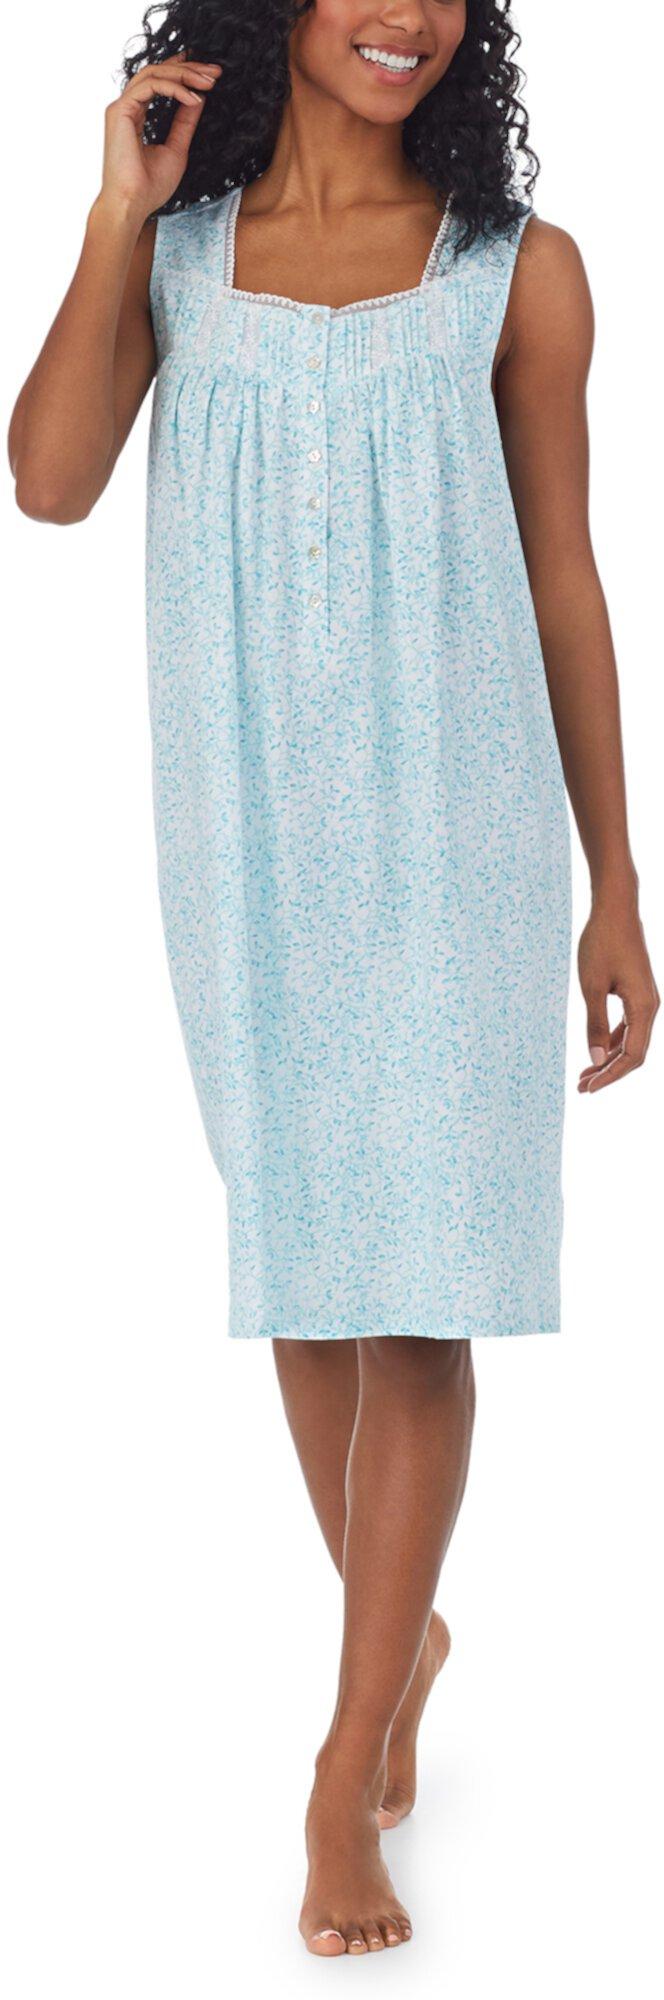 Cotton Knit Sleeveless Chemise Eileen West